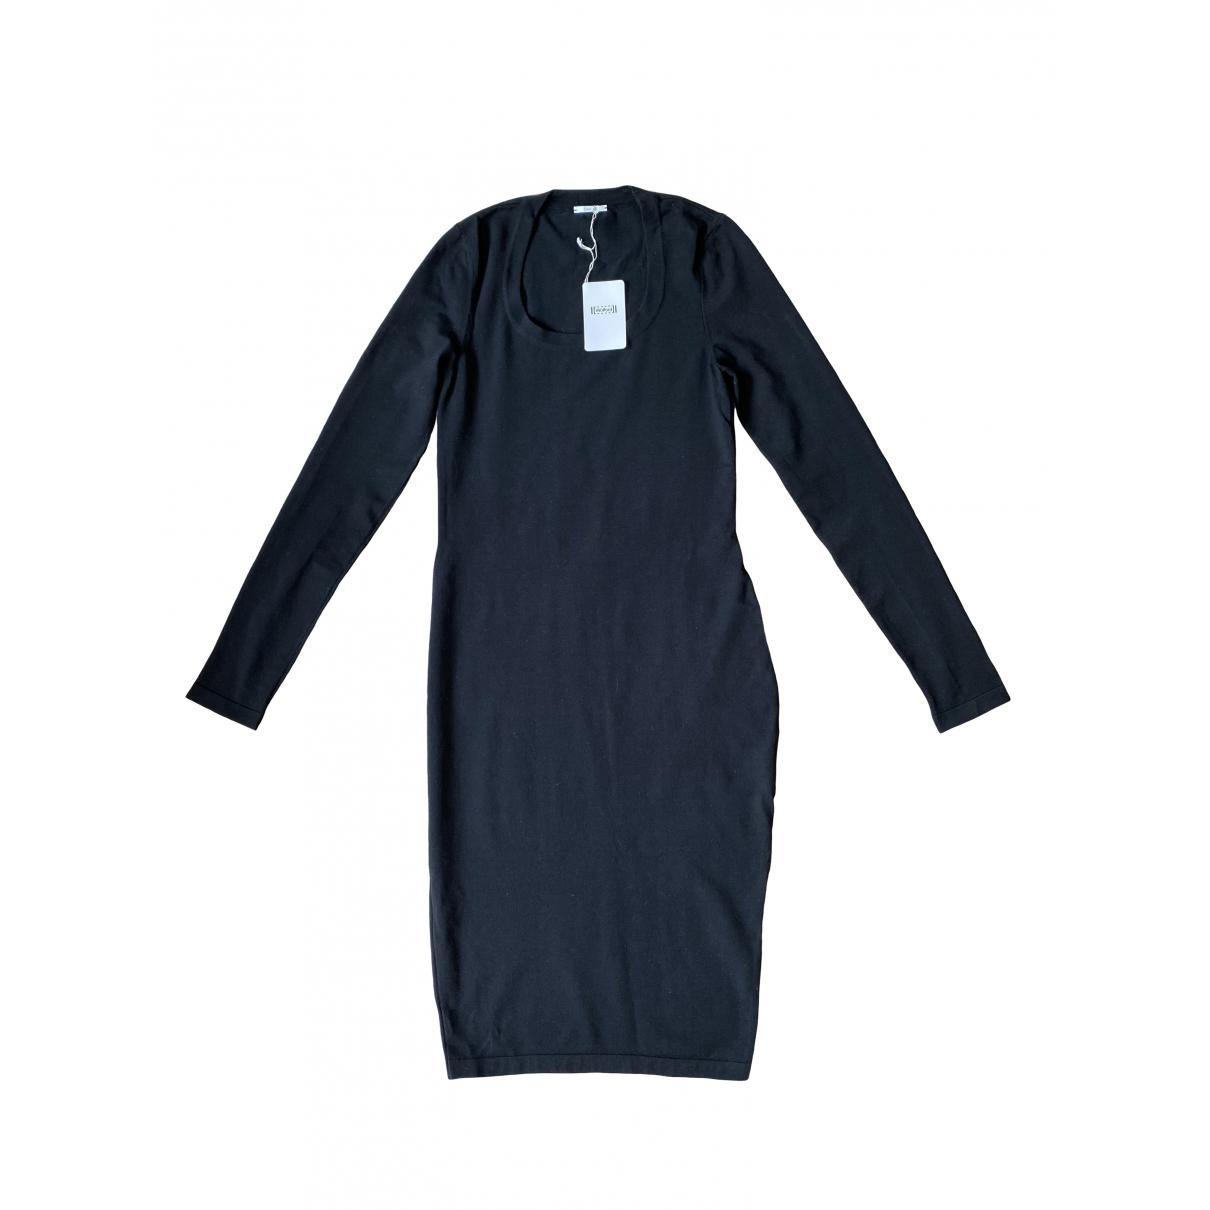 Wolford \N Black Wool dress for Women XS International